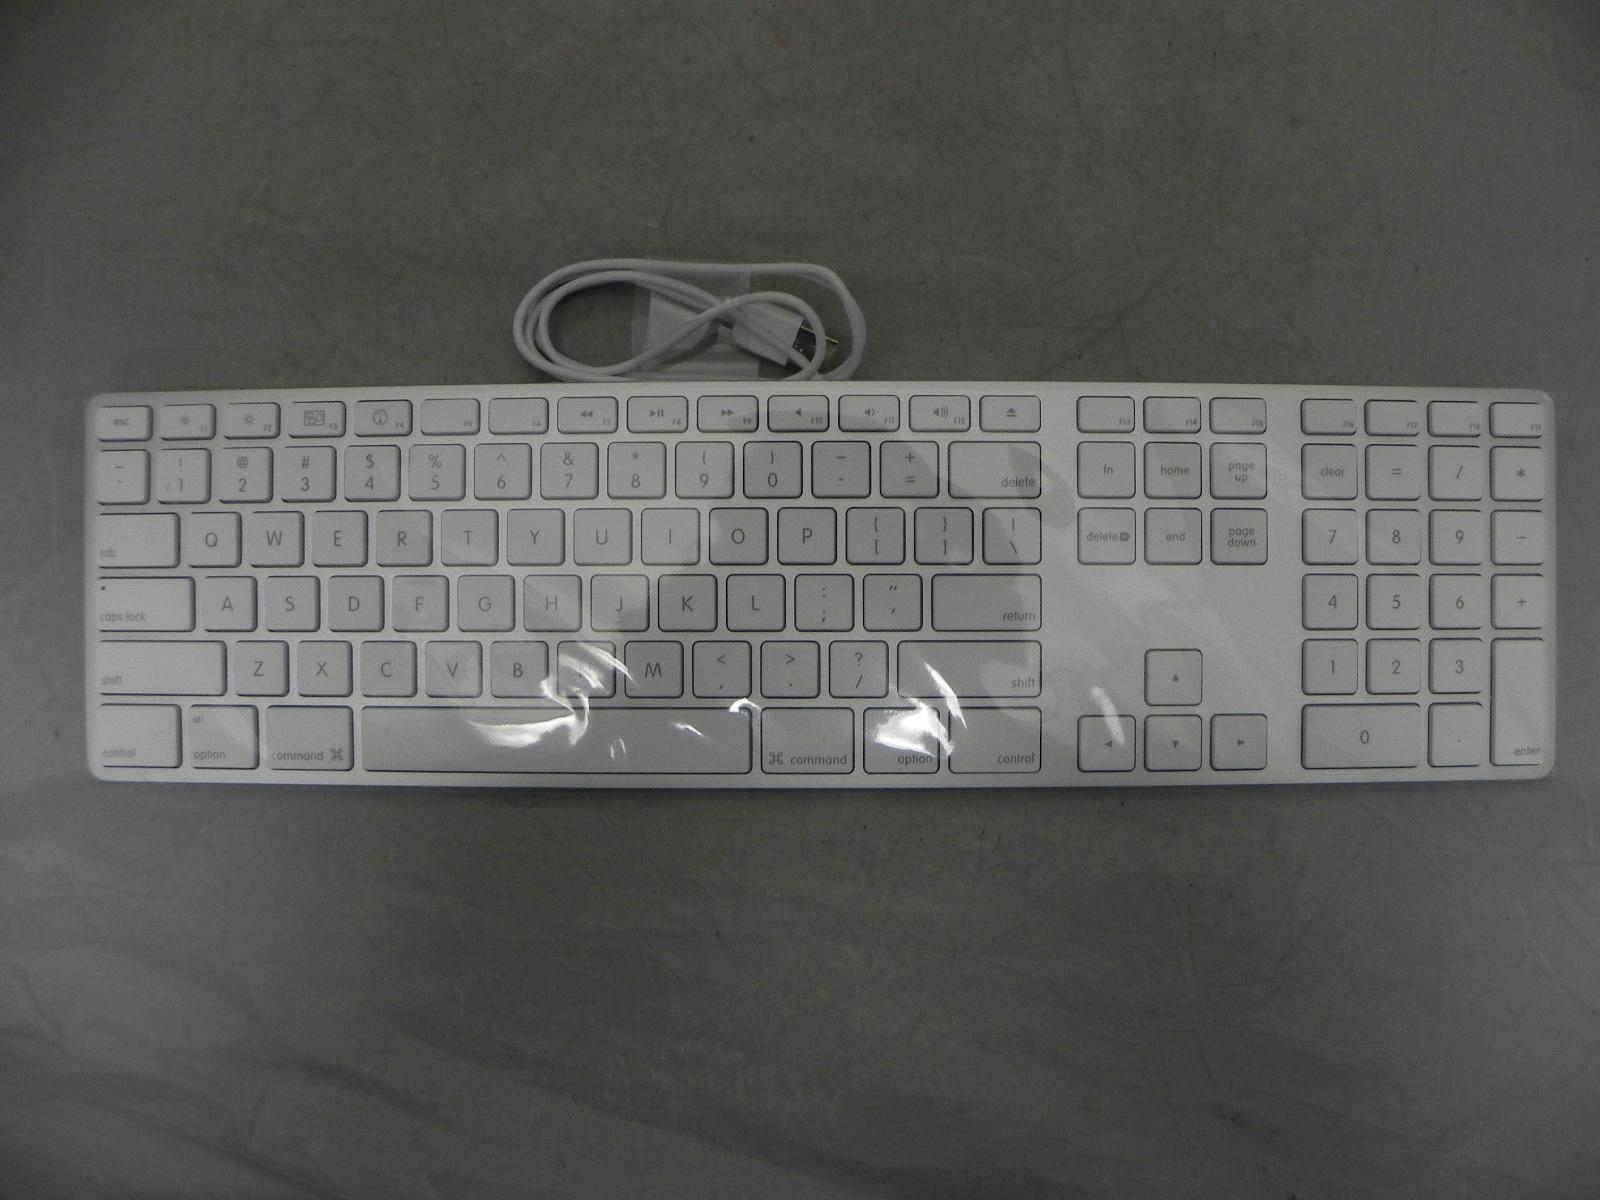 apple aluminum keyboard a1243 wired usb keyboard mouse osx 602 6330 a bundle. Black Bedroom Furniture Sets. Home Design Ideas